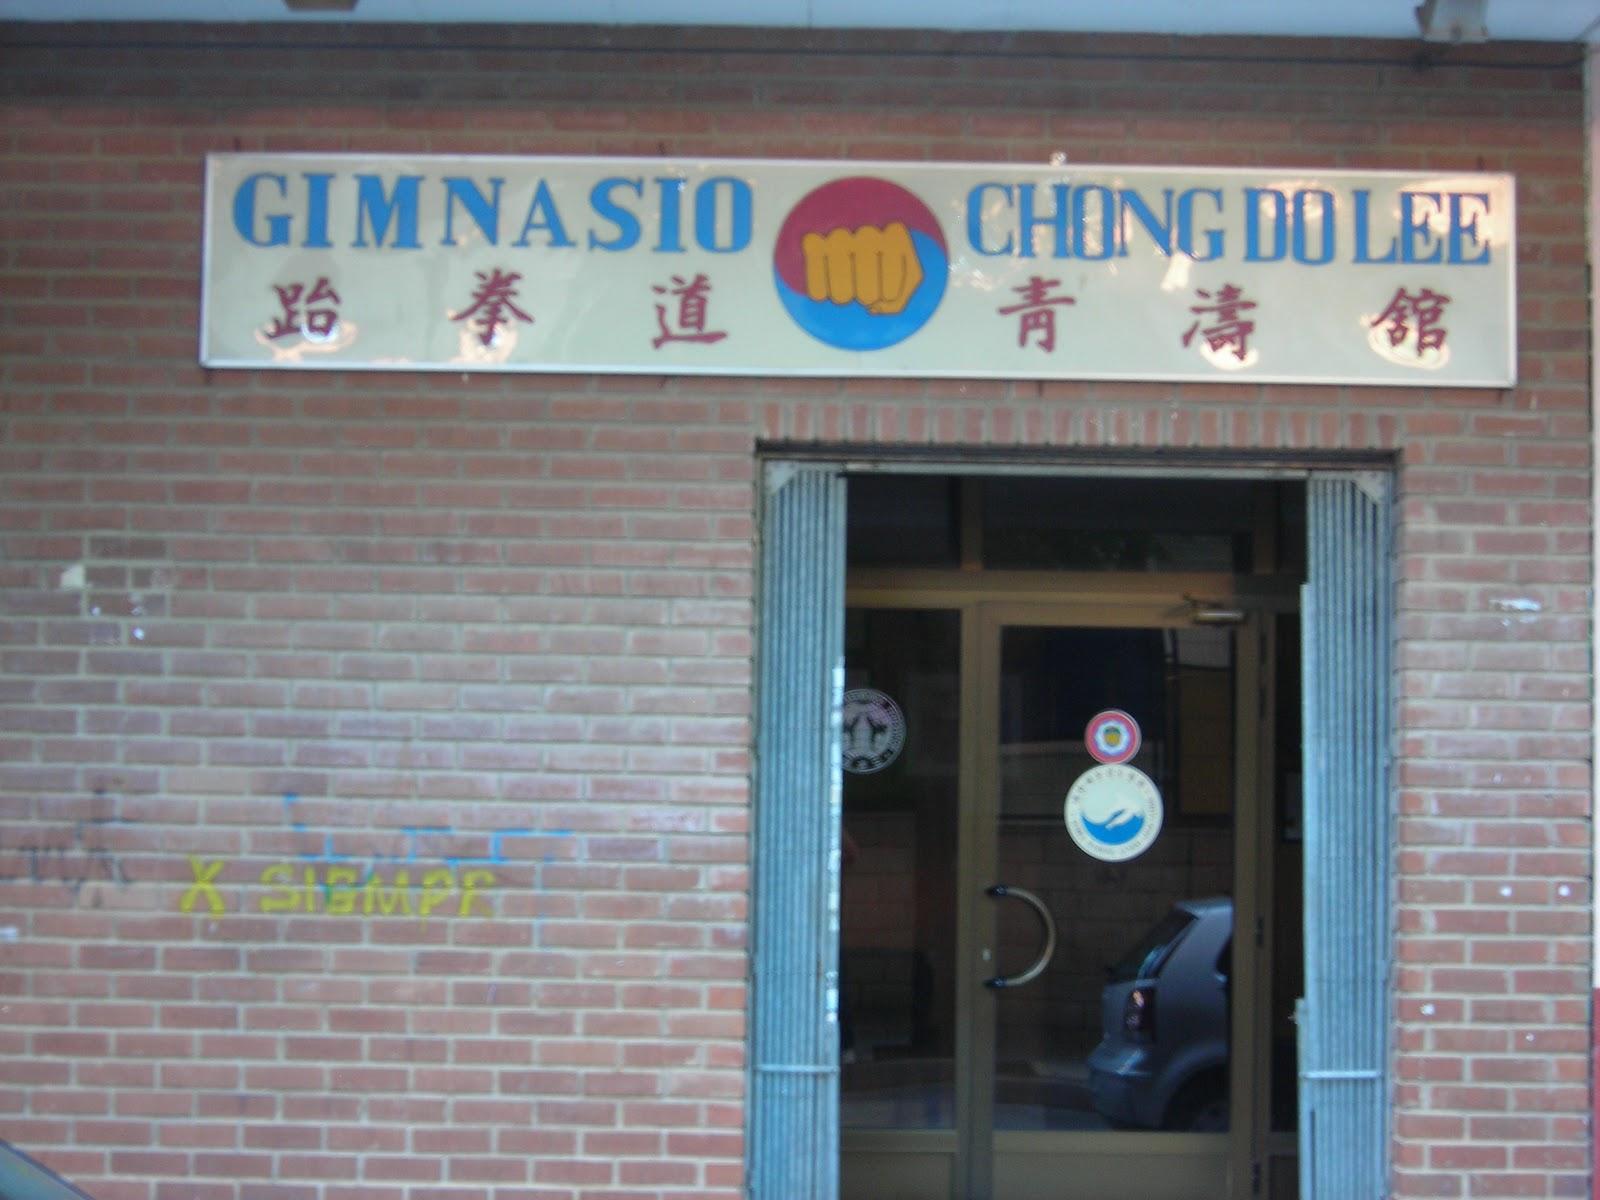 Taekwondo chong do lee valencia informaci n for Gimnasio xativa